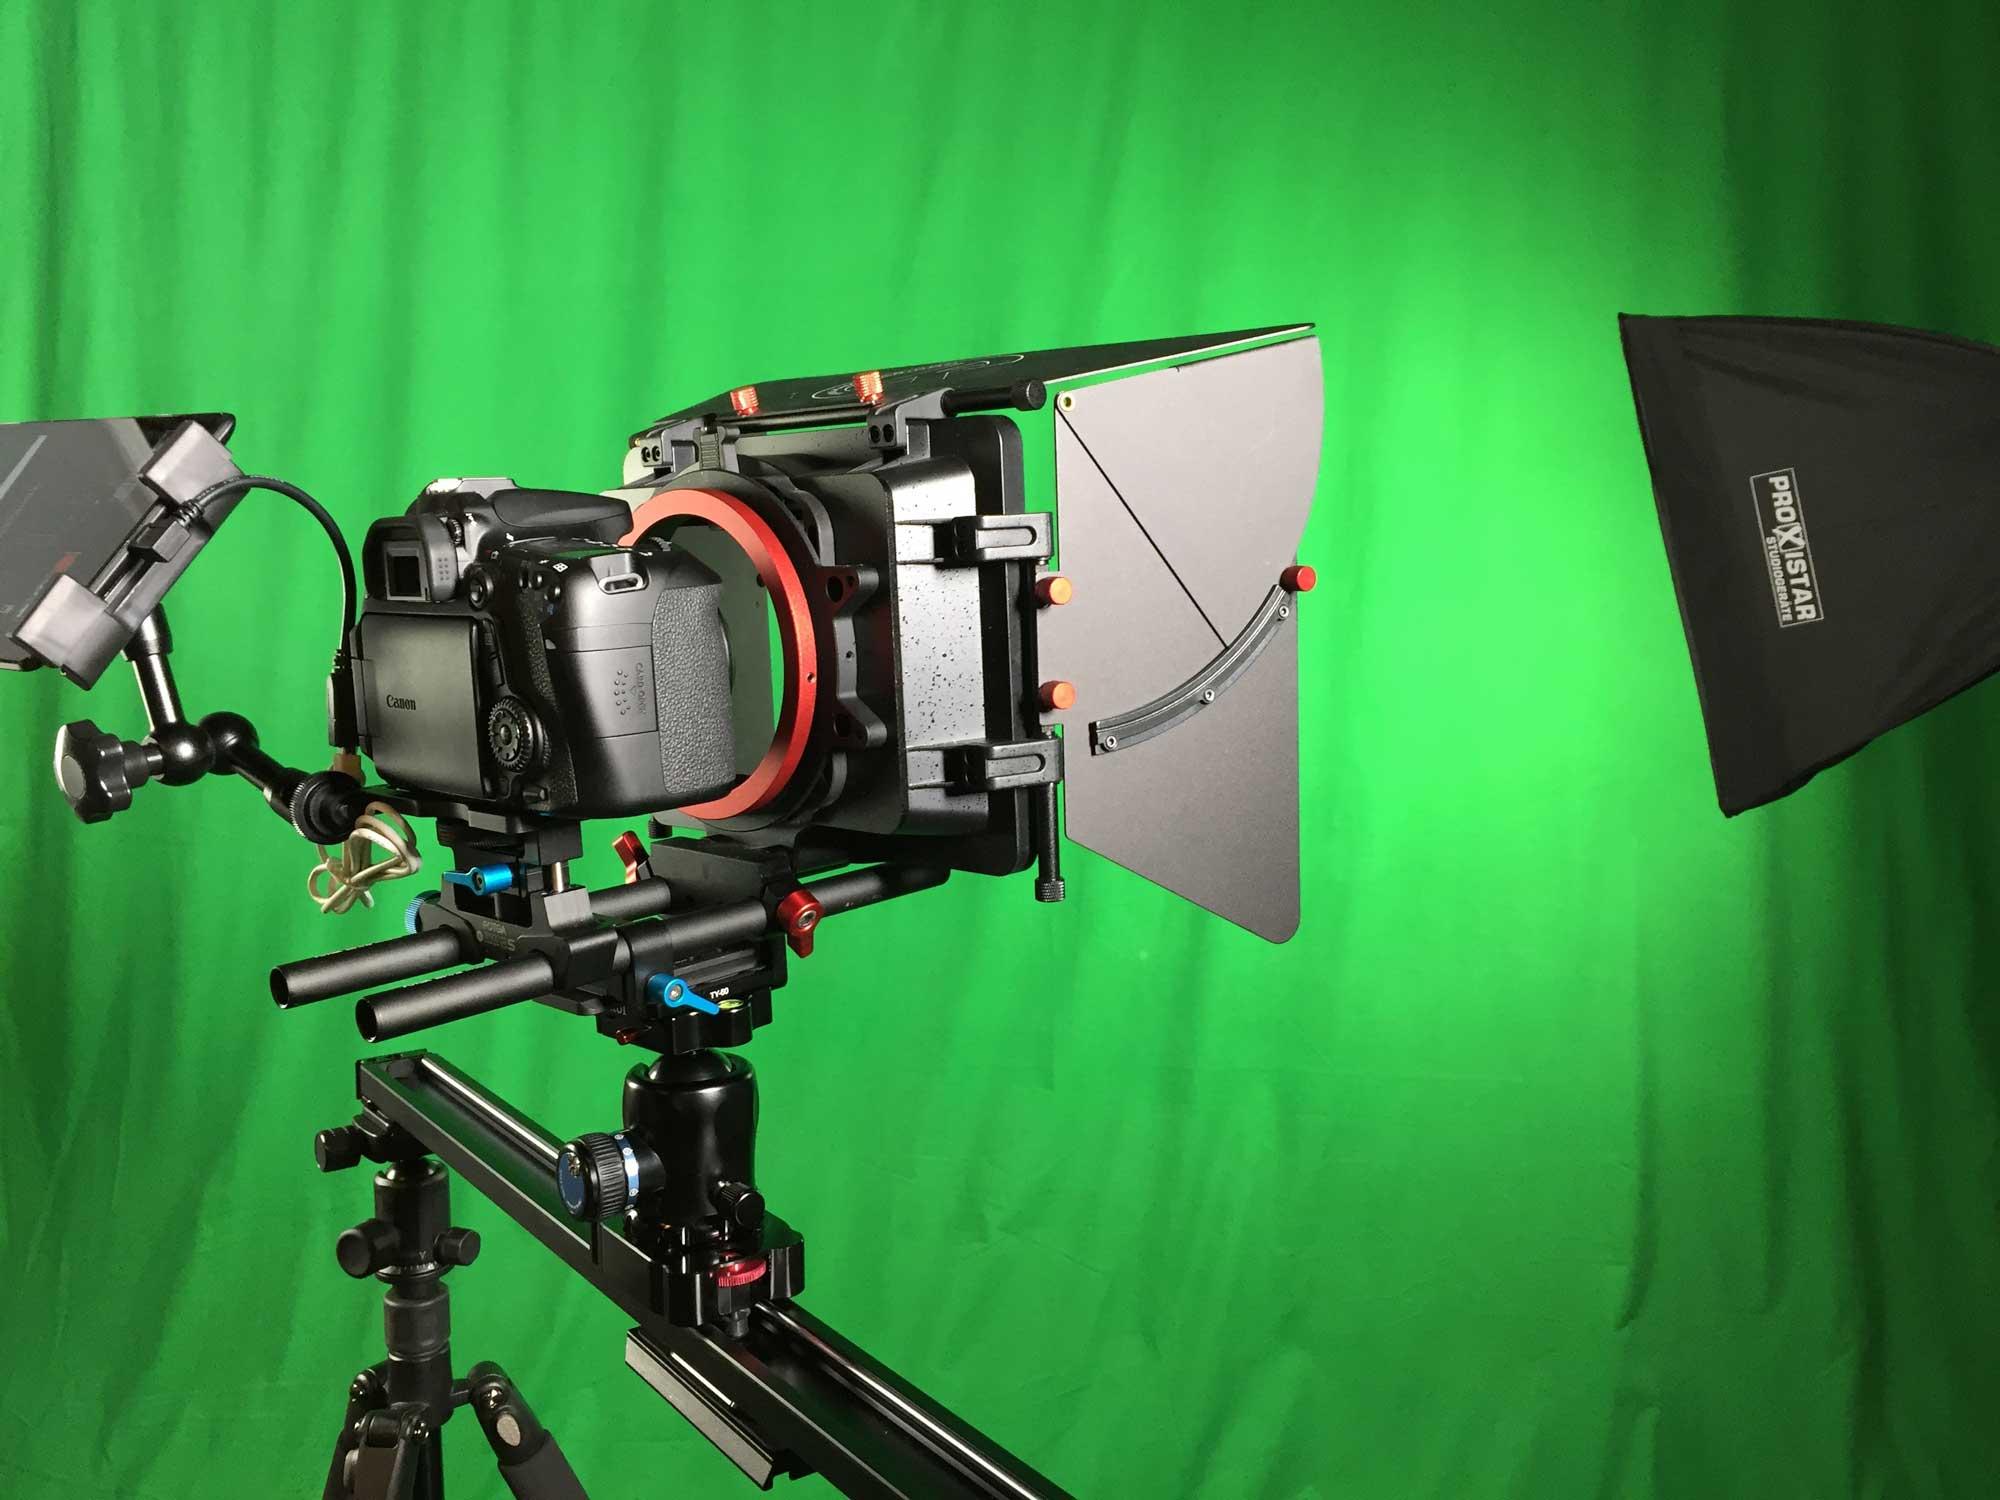 Homeoffice-Videokonferenz-Greenscreen-Technik-02